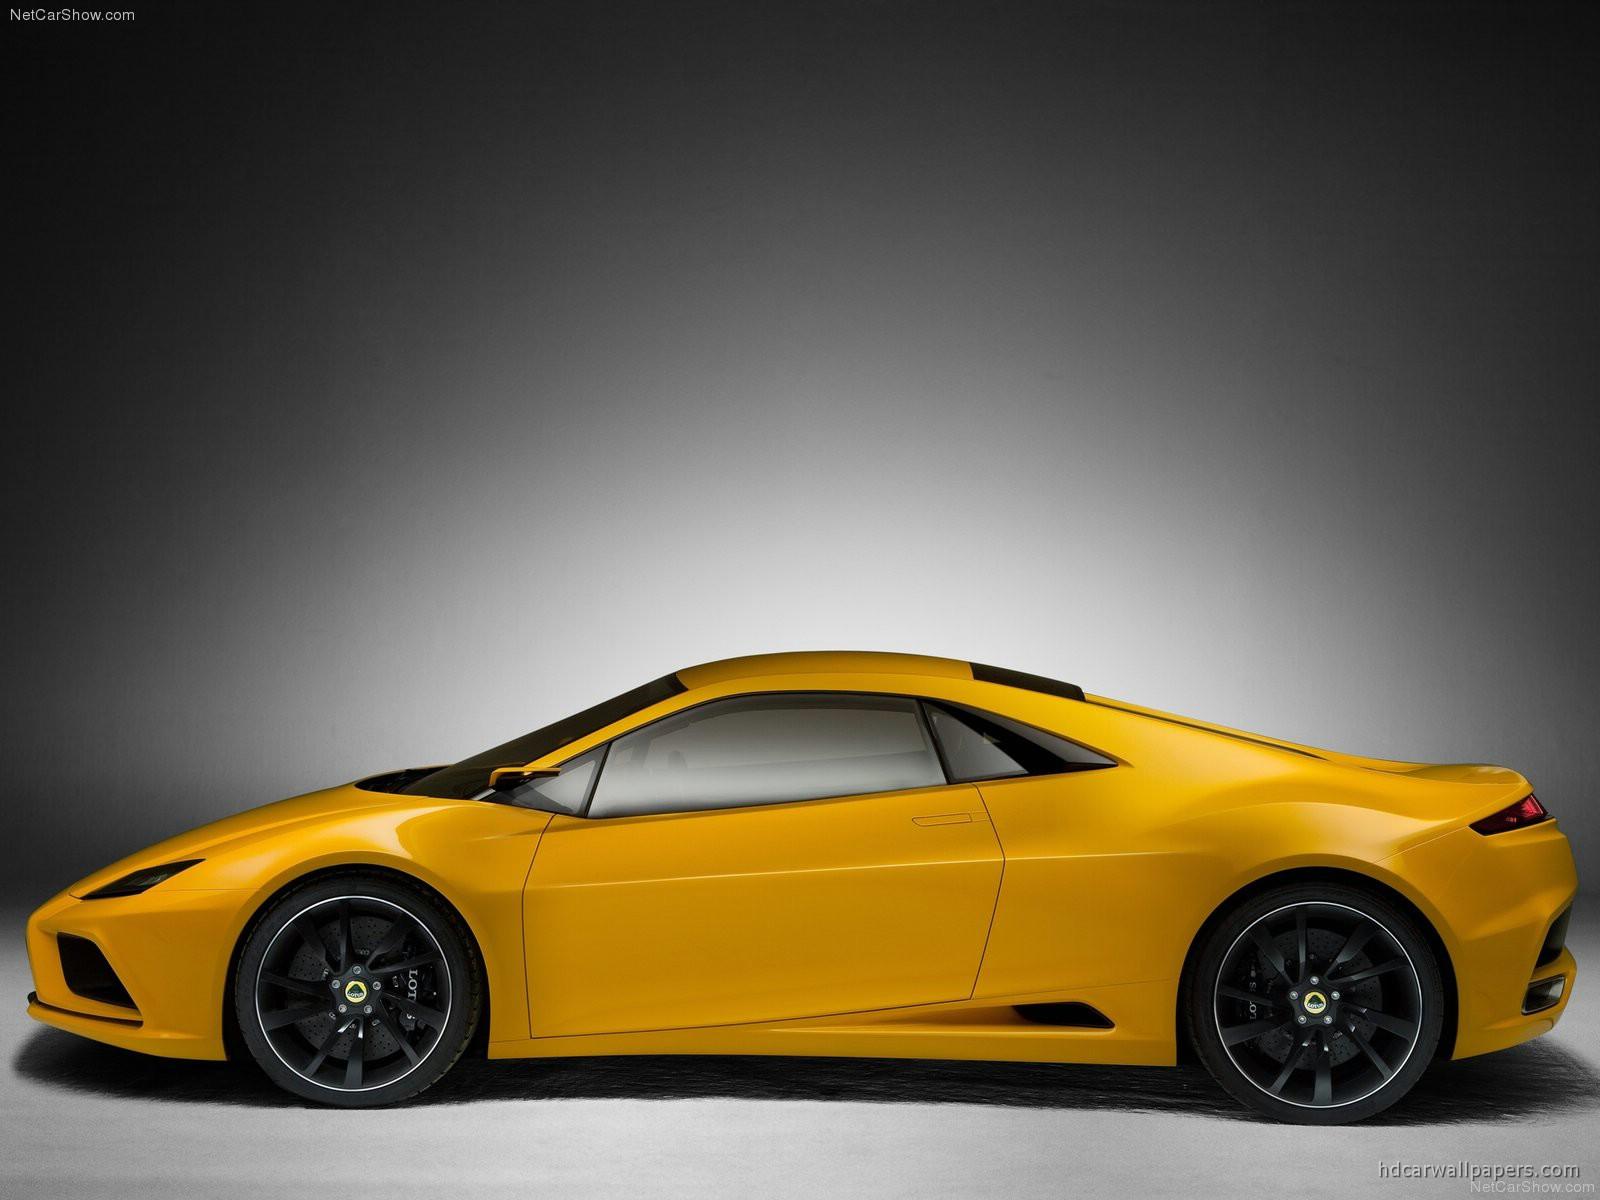 2010 lotus elan concept car wallpaper | hd car wallpapers | id #1886